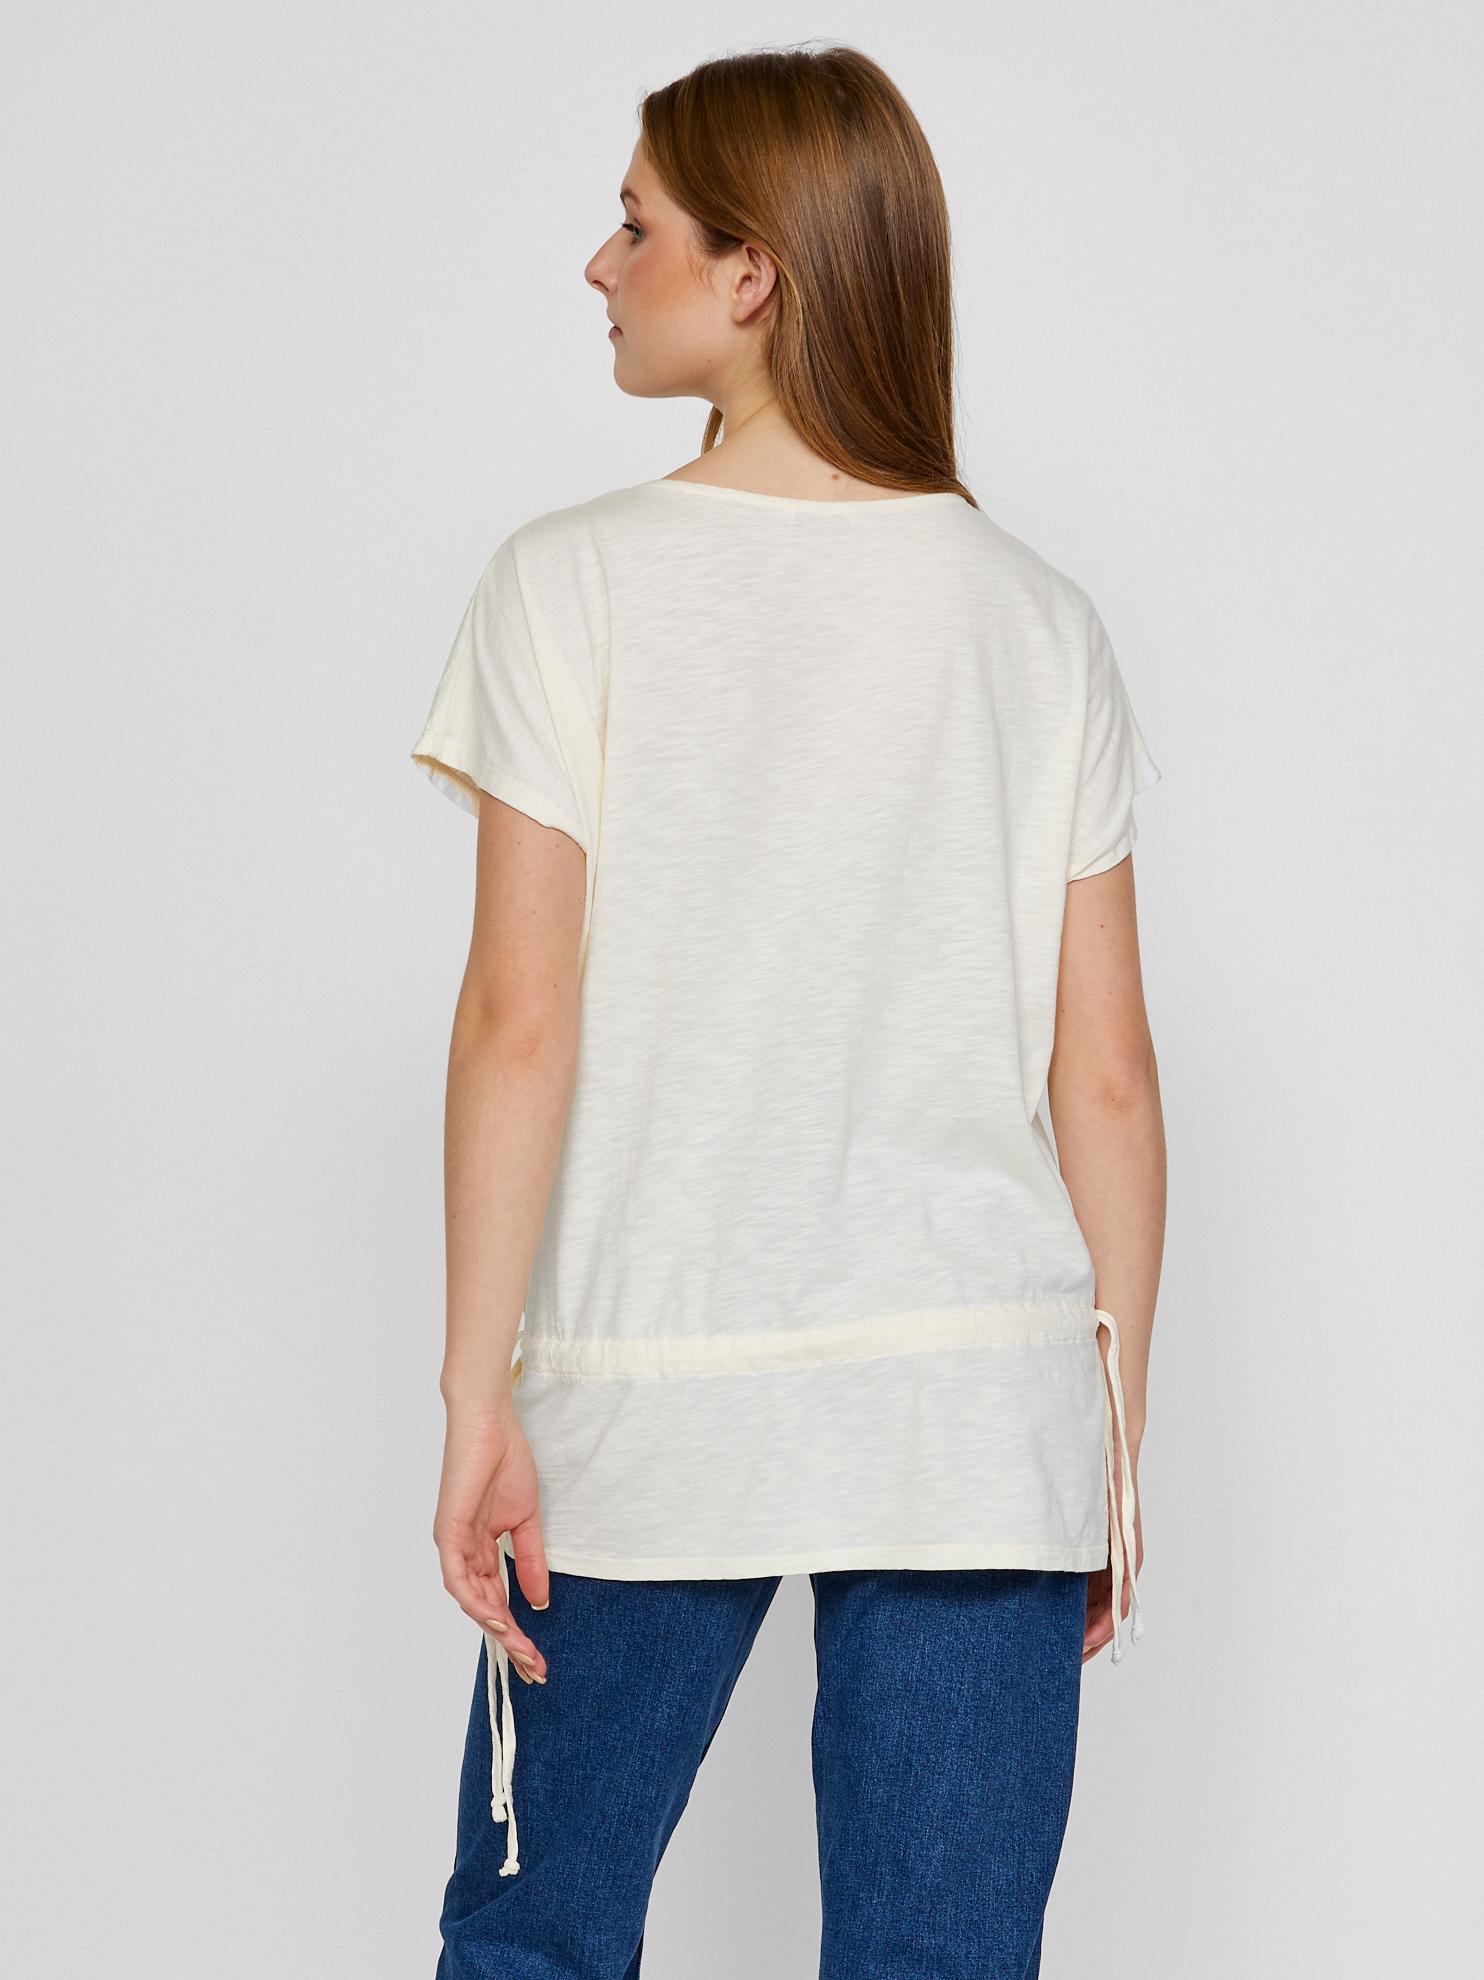 CAMAIEU bianco maglietta con pizzo